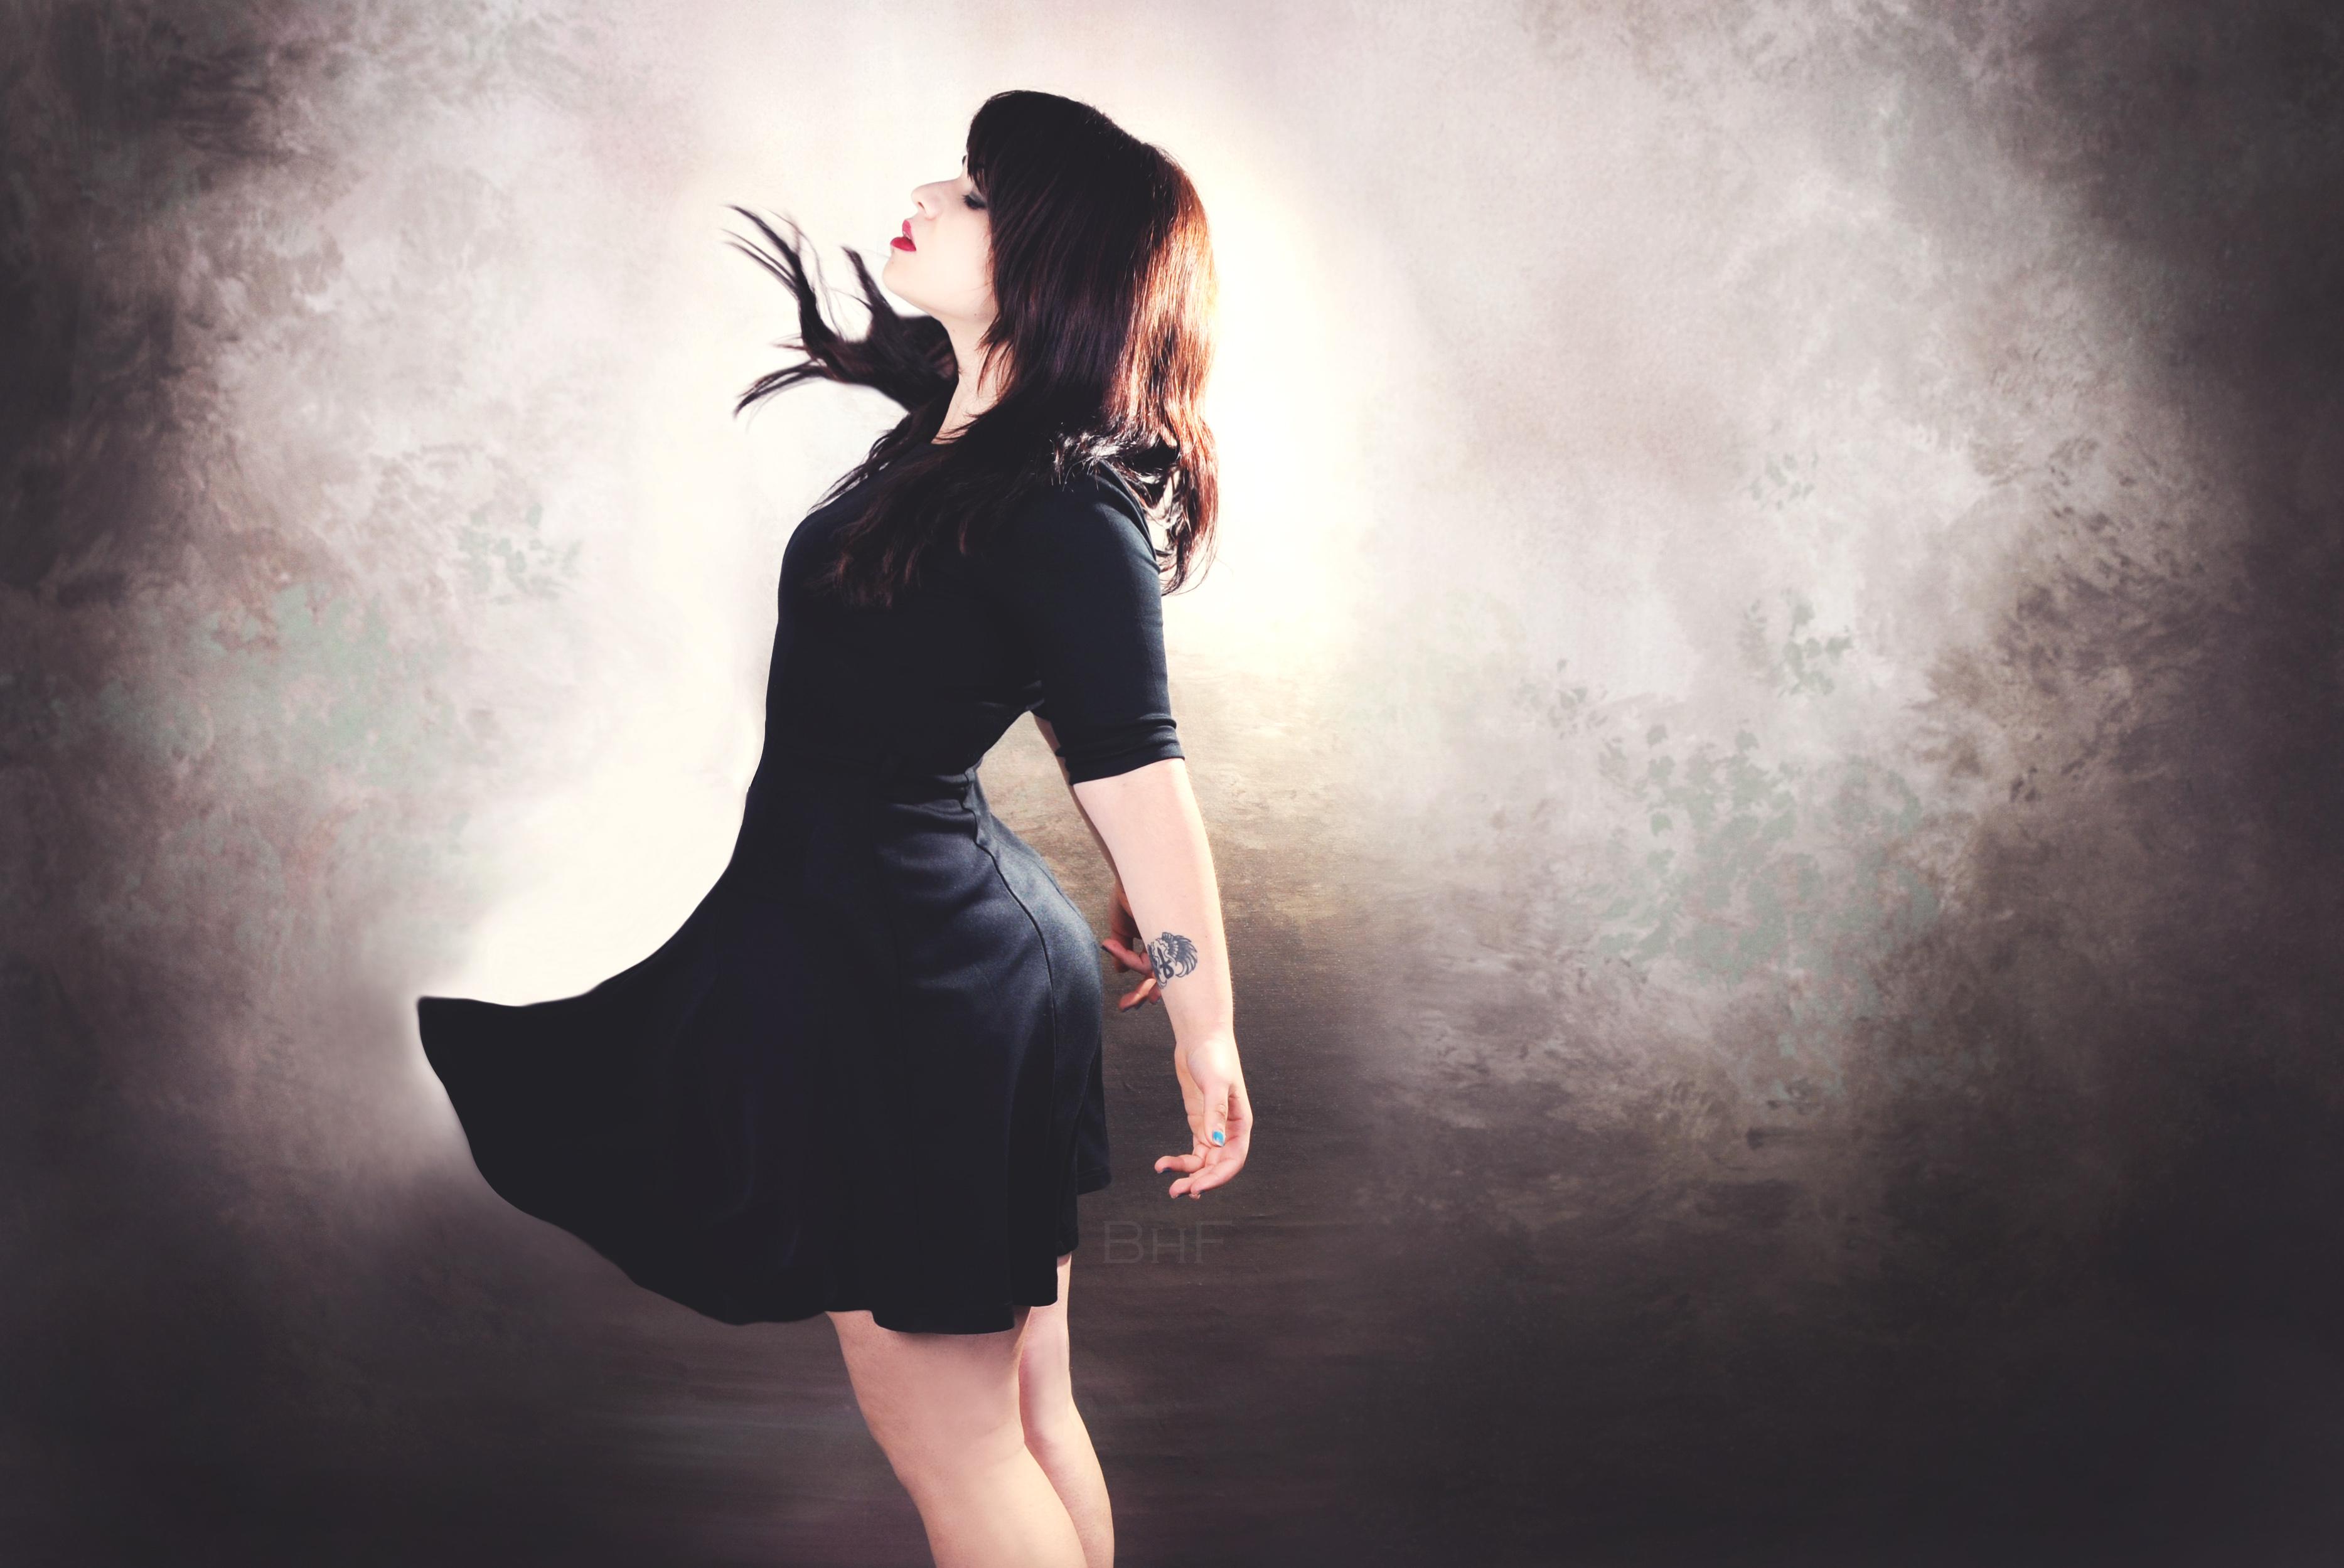 Wallpaper Black Model Shadow Photography Dress Tattoo